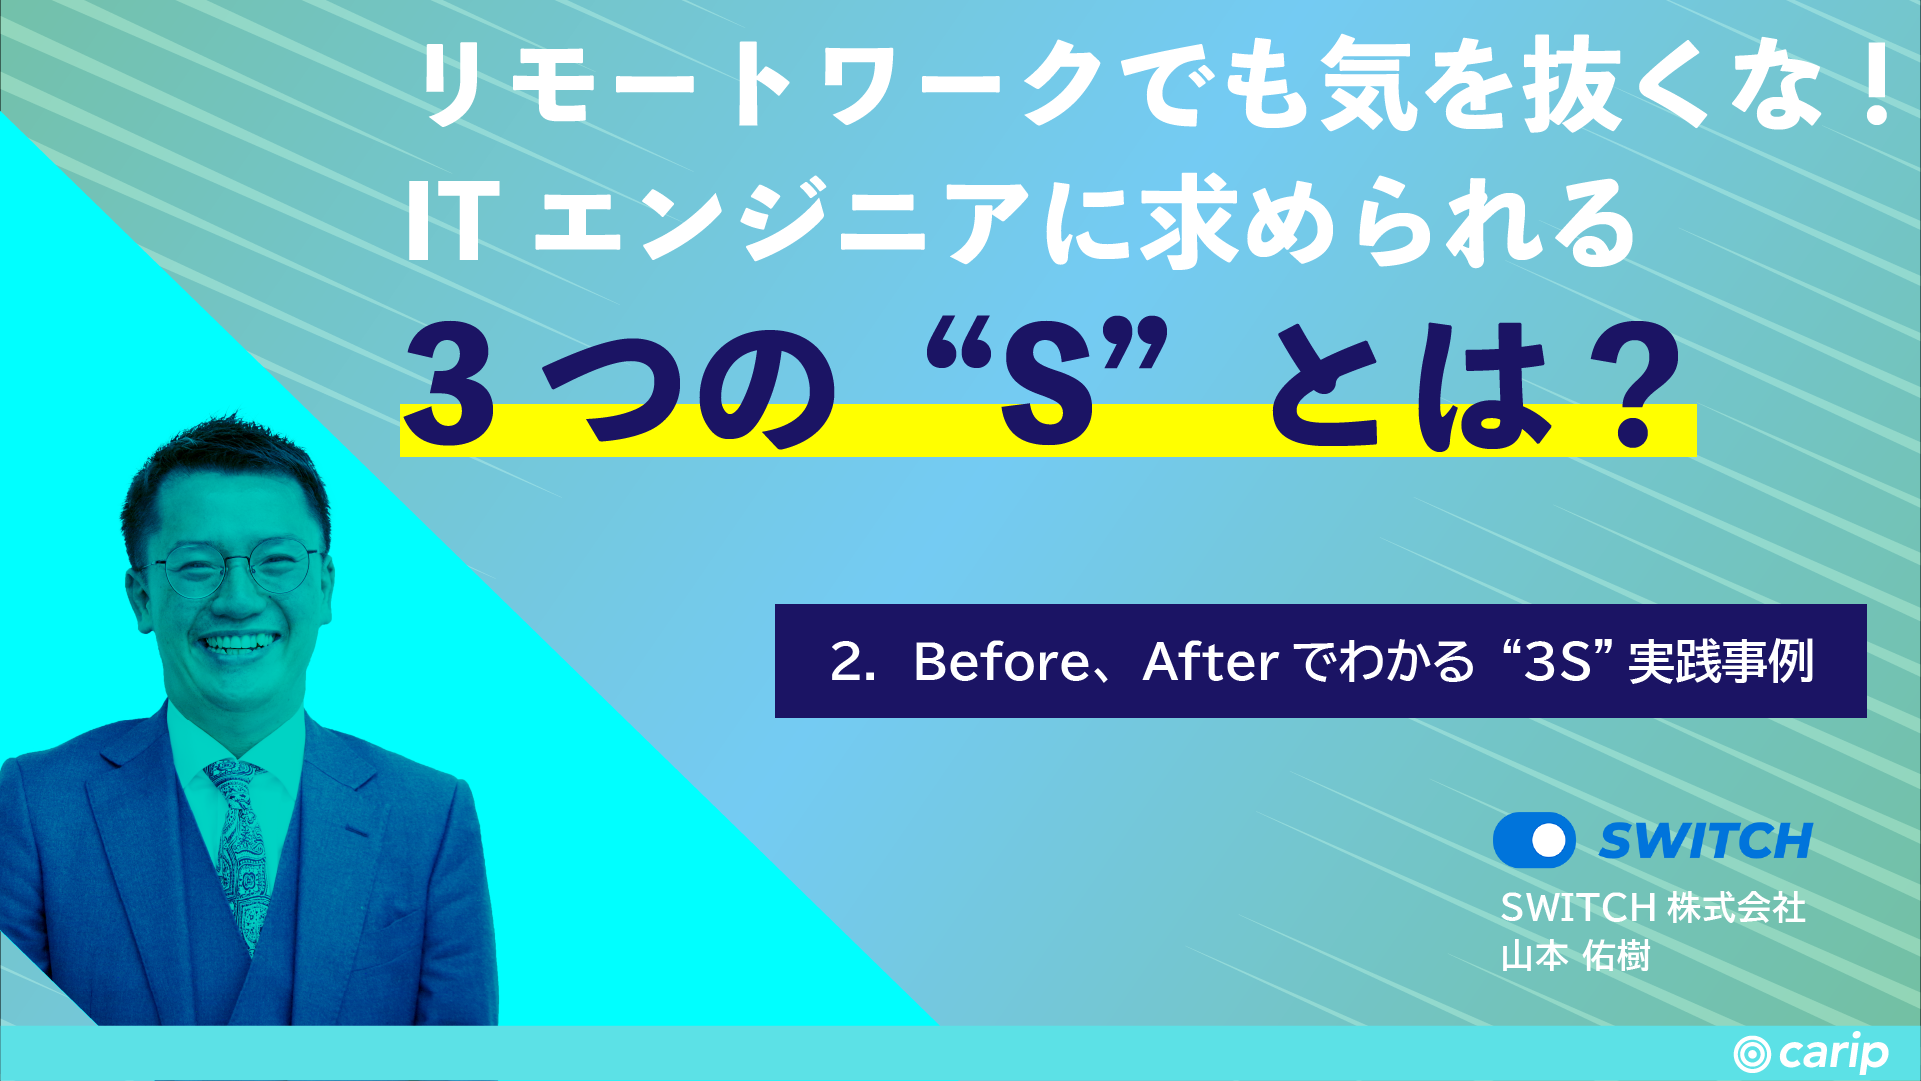 "2.Before、Afterでわかる""3S""実践事例"